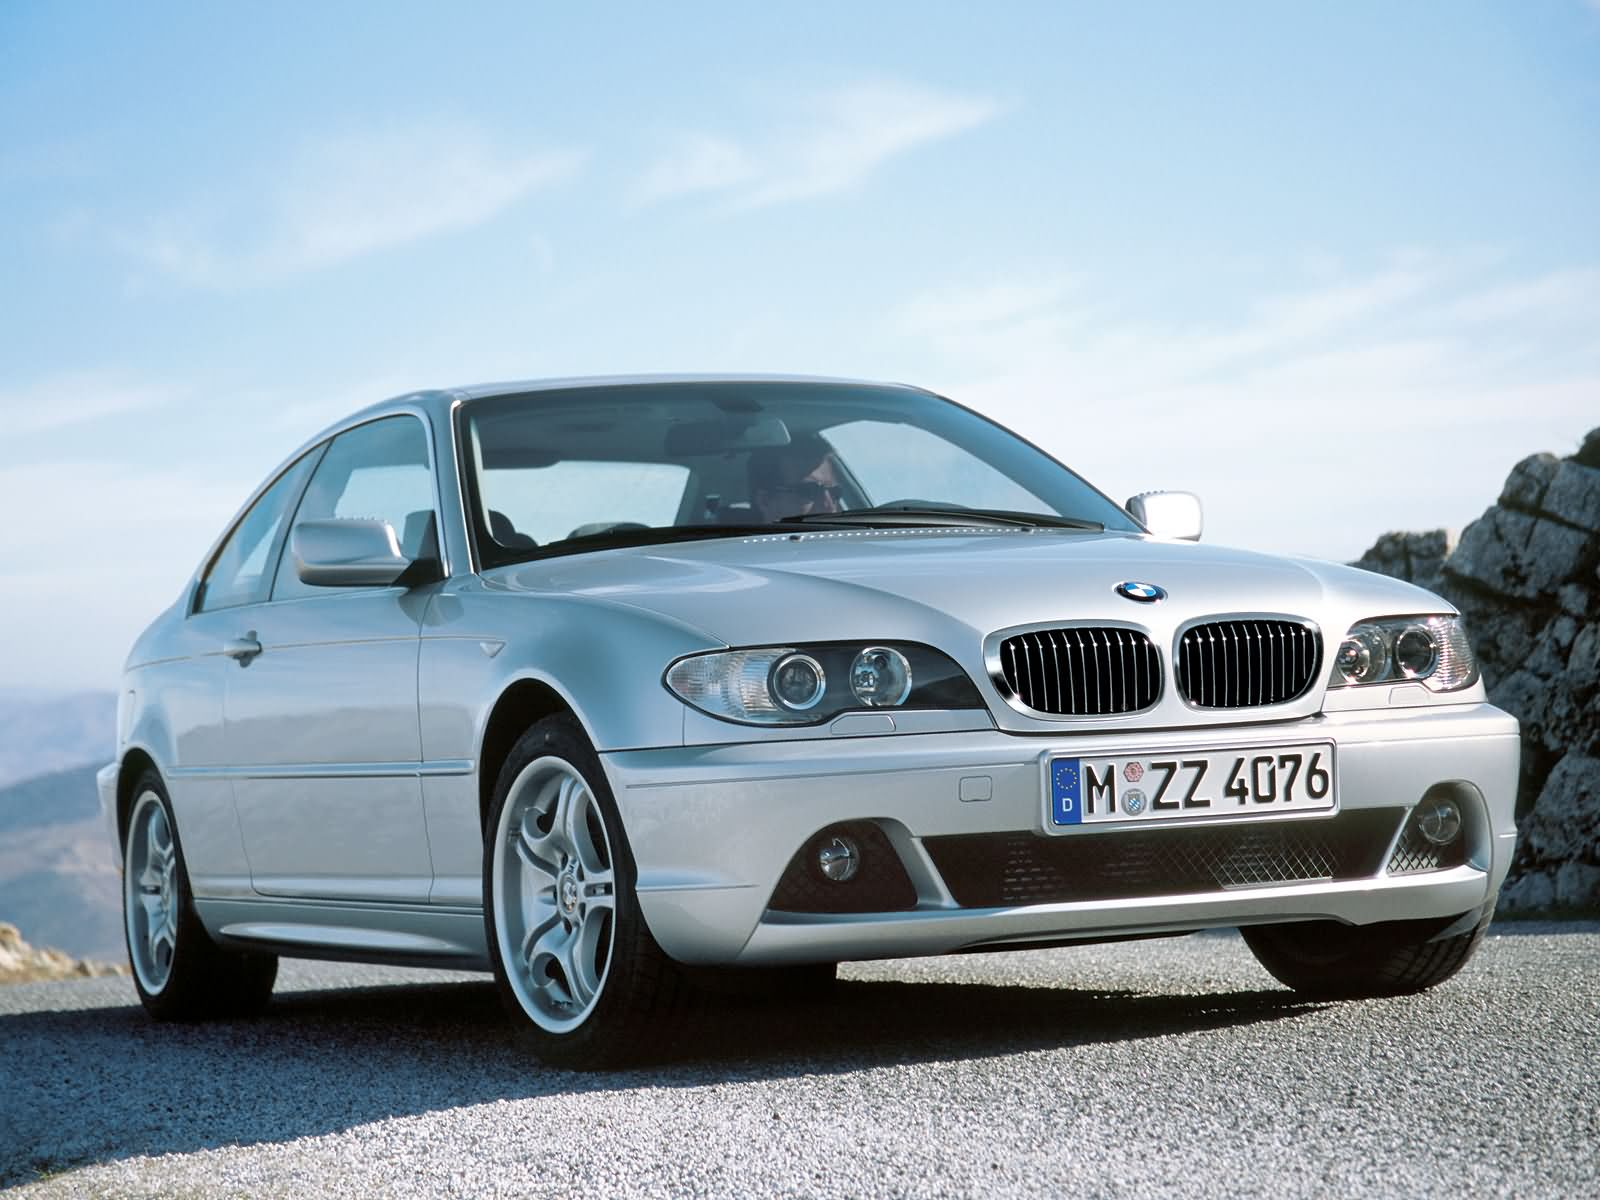 BMW Series E Photos PhotoGallery With Pics CarsBasecom - Bmw 3 series e46